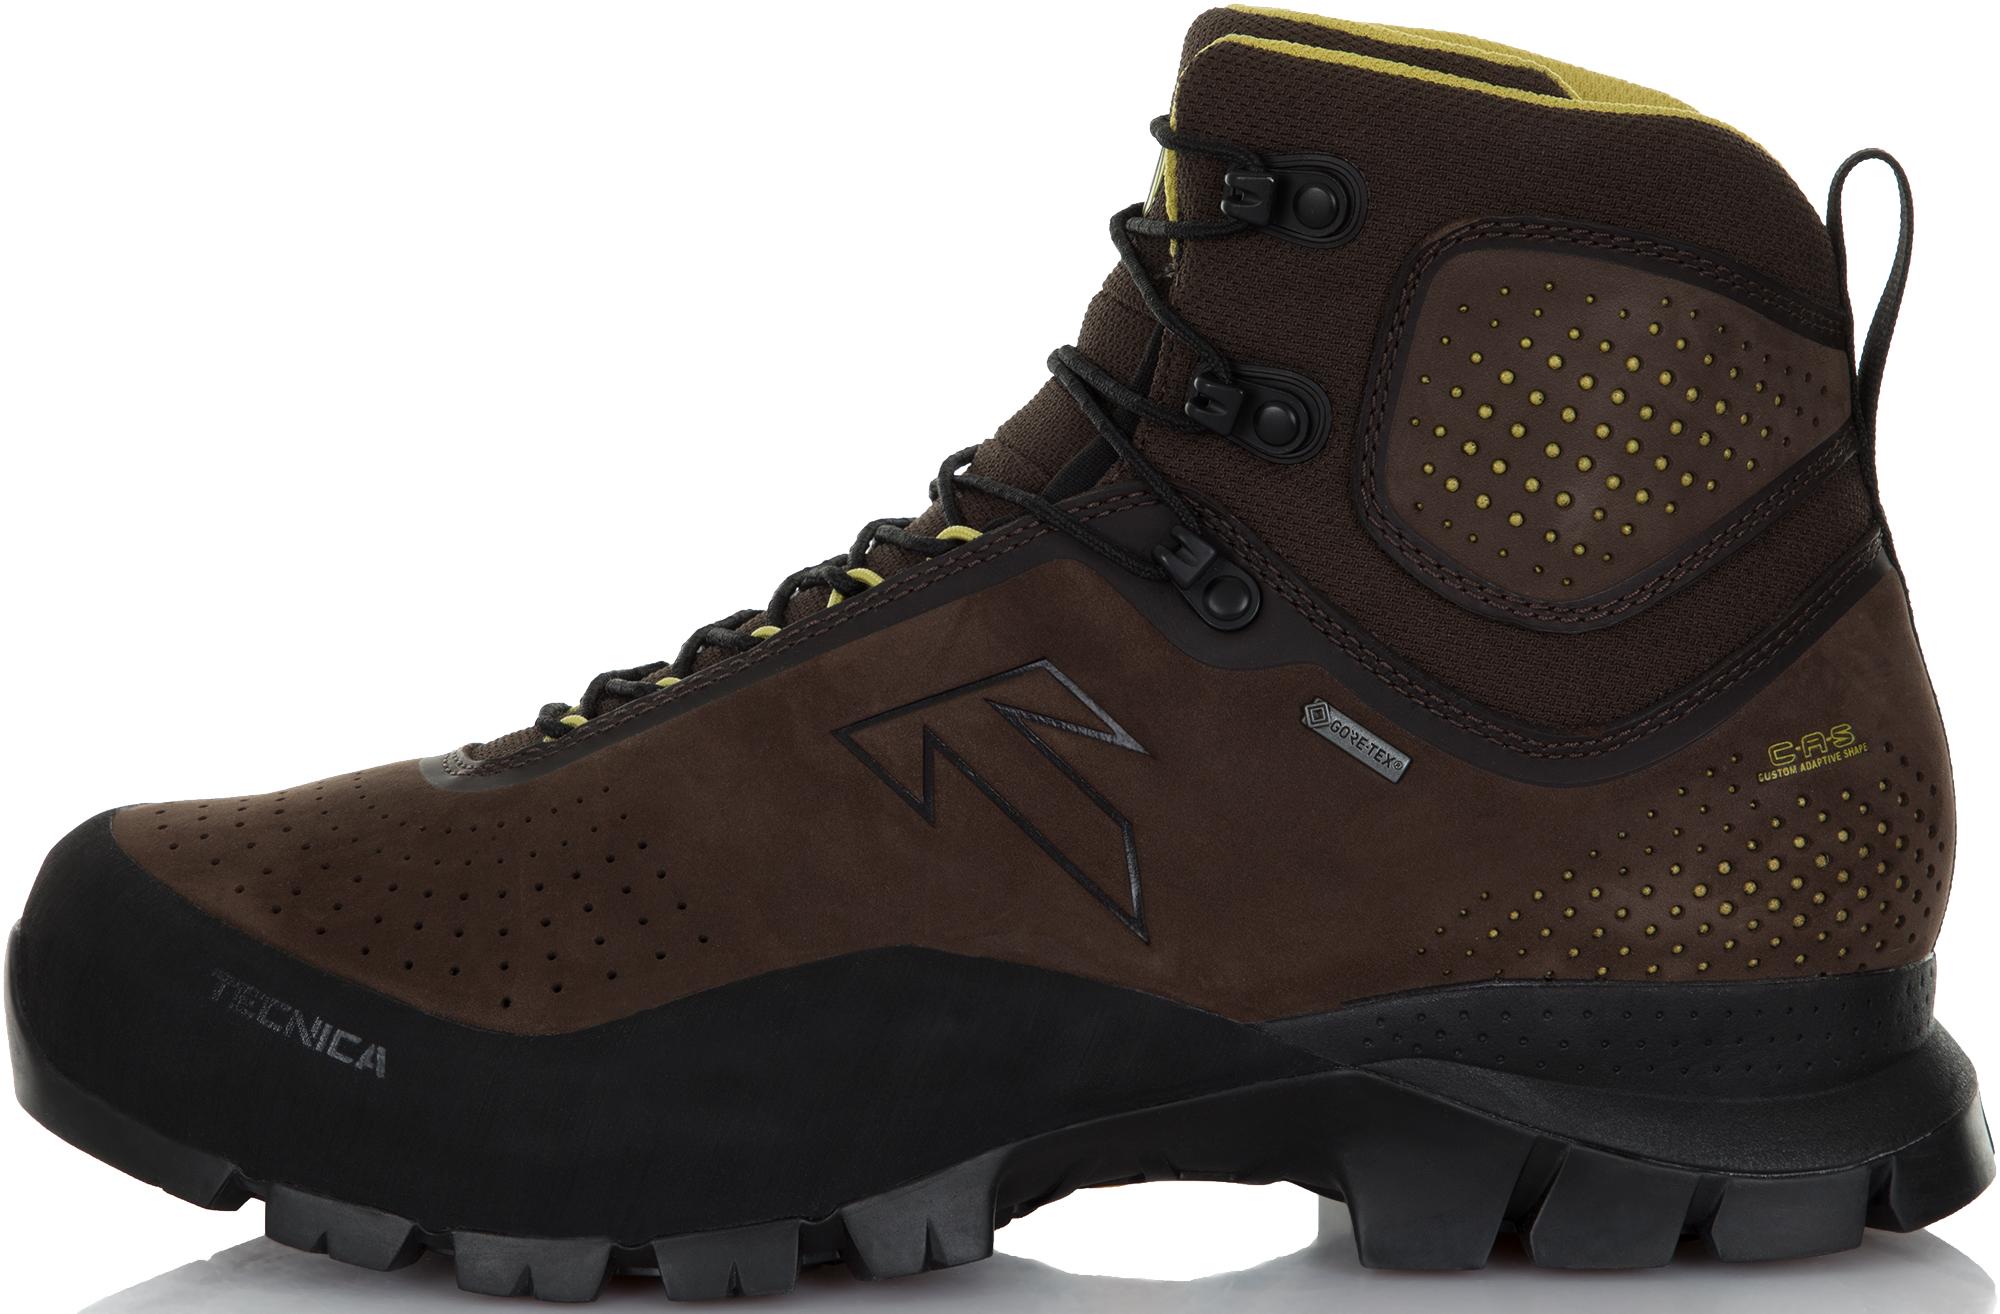 Tecnica Ботинки мужские Forge, размер 45